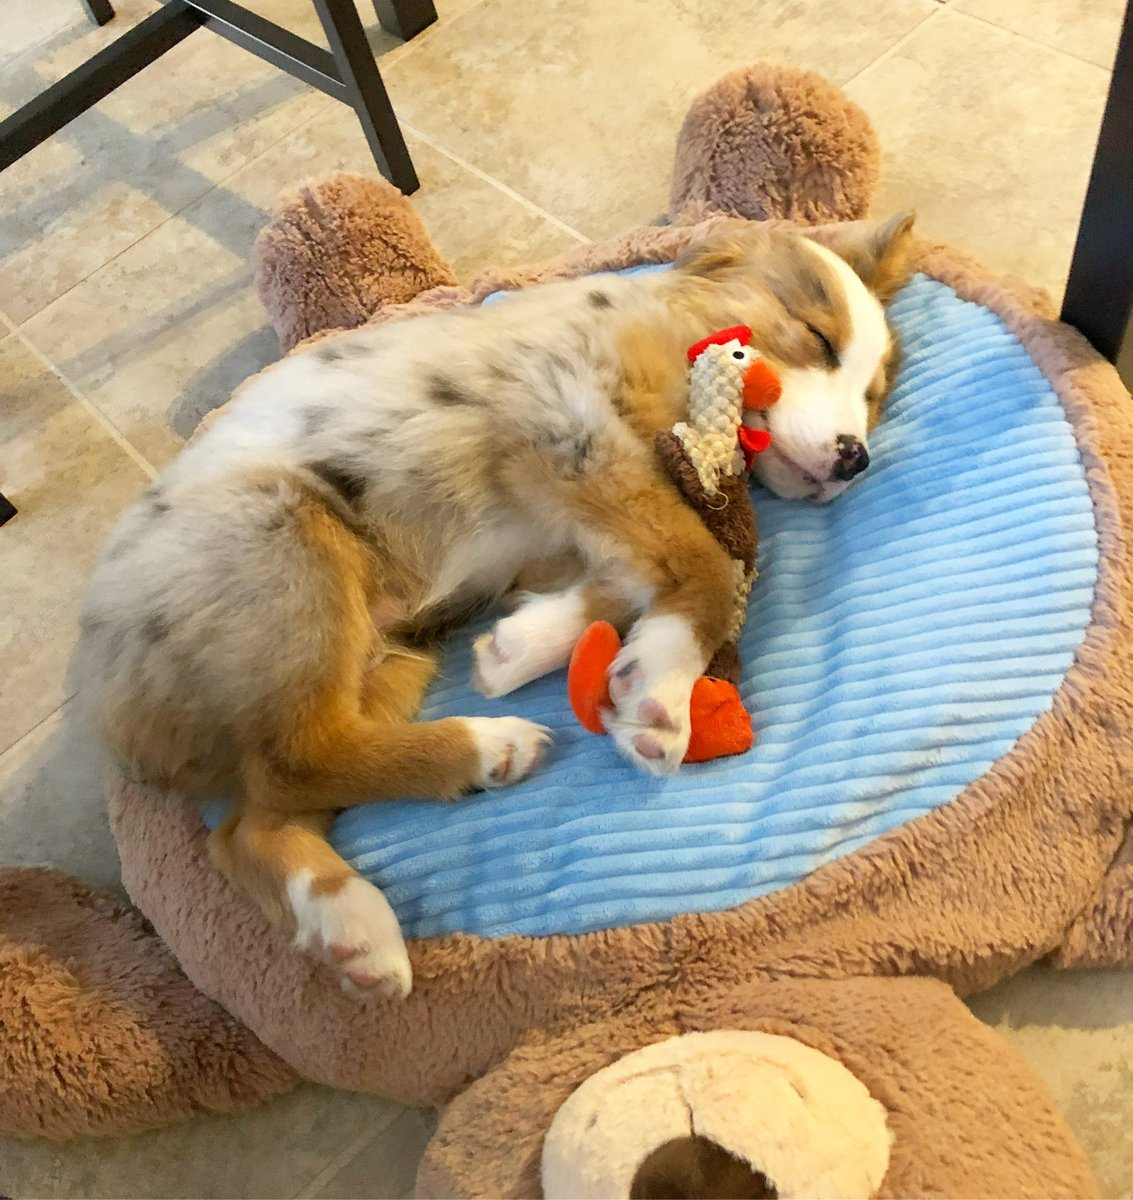 #australianshepherdsofinstagram #aussielove #aussies #aussiesdoingthings #miniamericanshepherd #australianshepherd #aussie #miniaussie #aussielovers #australianshepherds #thecuriousmaxx @dog_feelings @aussiesdointhgs @IvePetThatDog @DogsTrust @dogsquadtv <3pic.twitter.com/NhSAb4vDzn